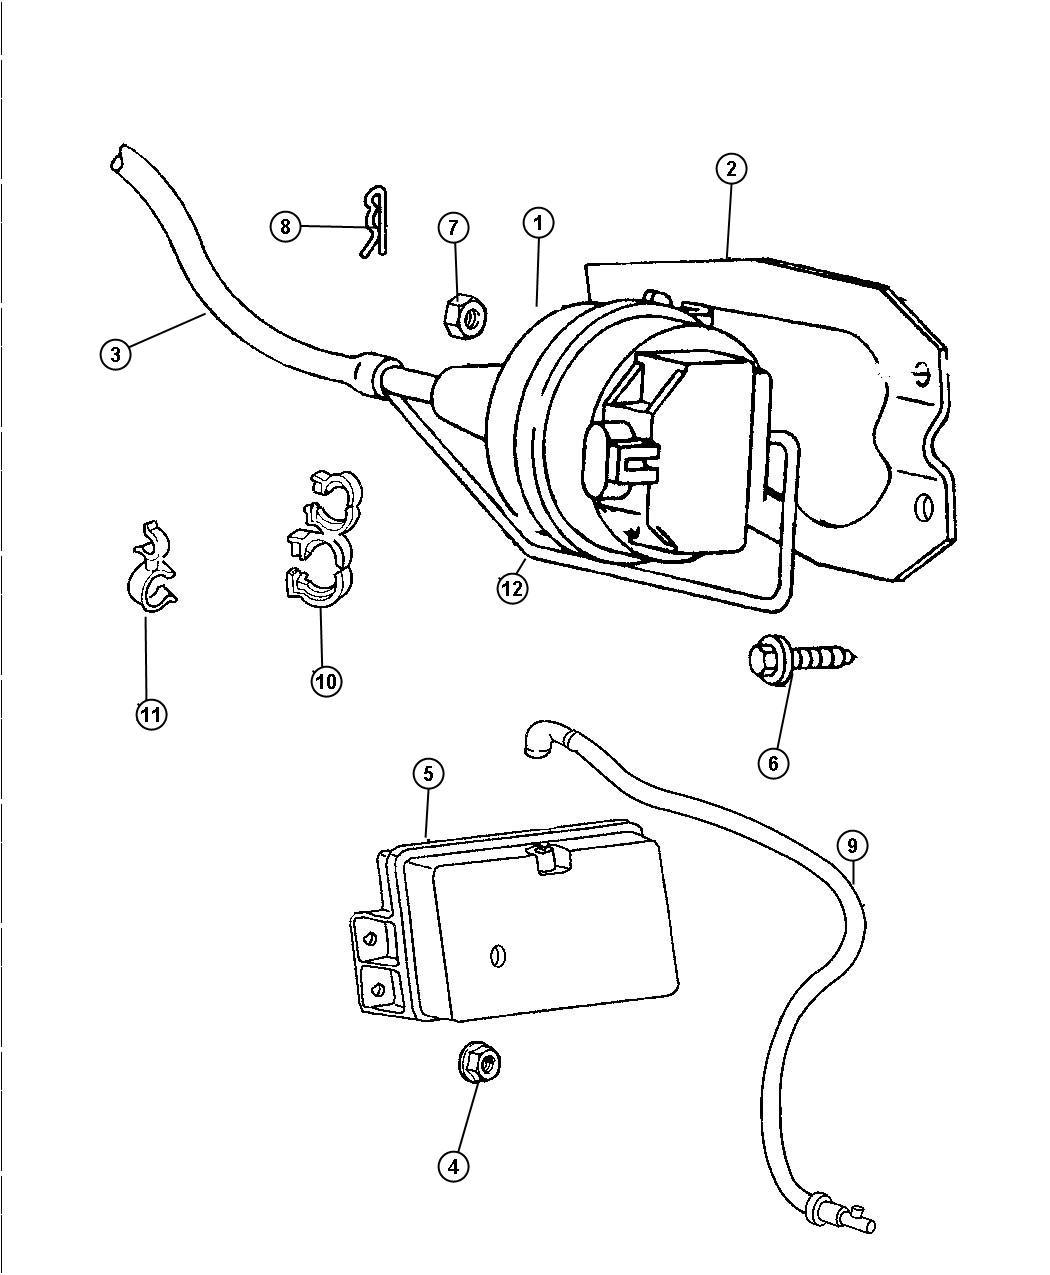 1999 Dodge Ram 2500 Harness. Vacuum speed control. 5.9l